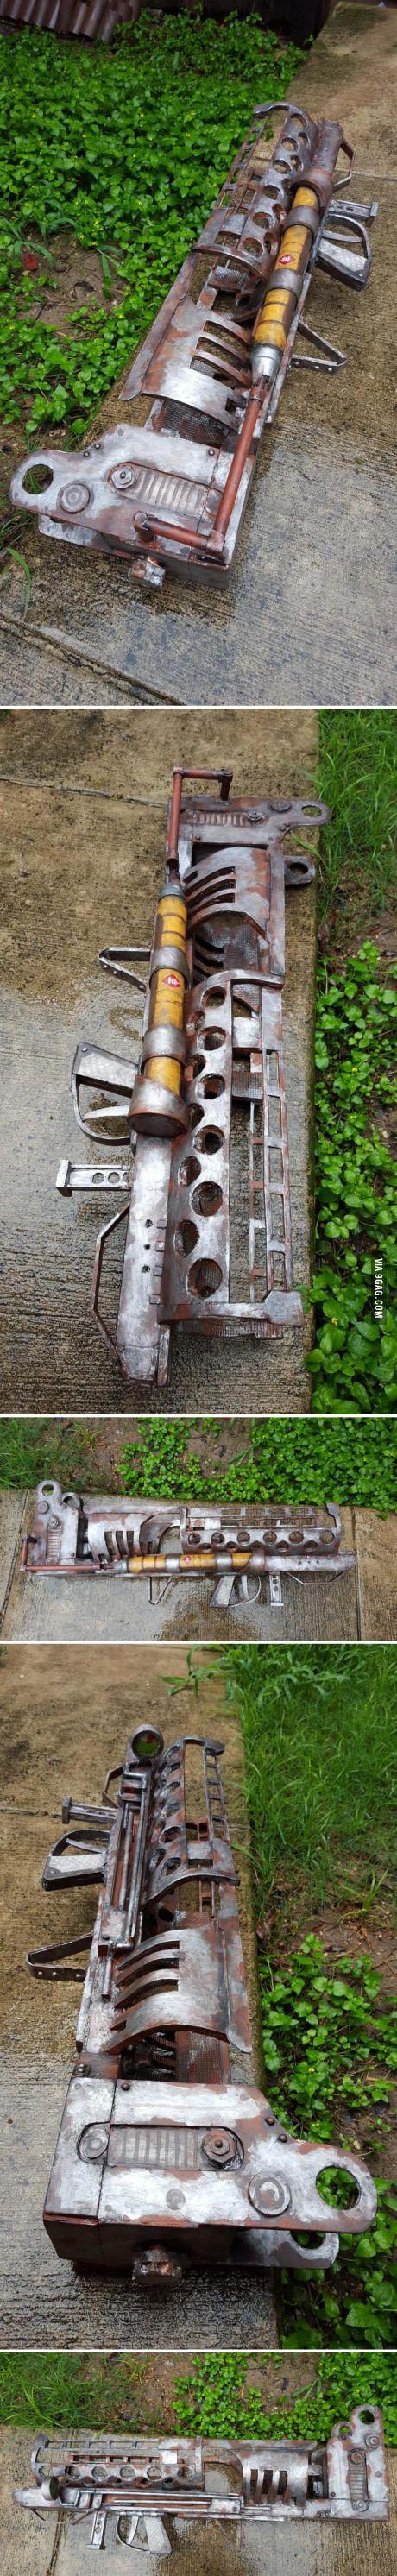 I built a Fatman Mini Nuke Launcher from Fallout 4.